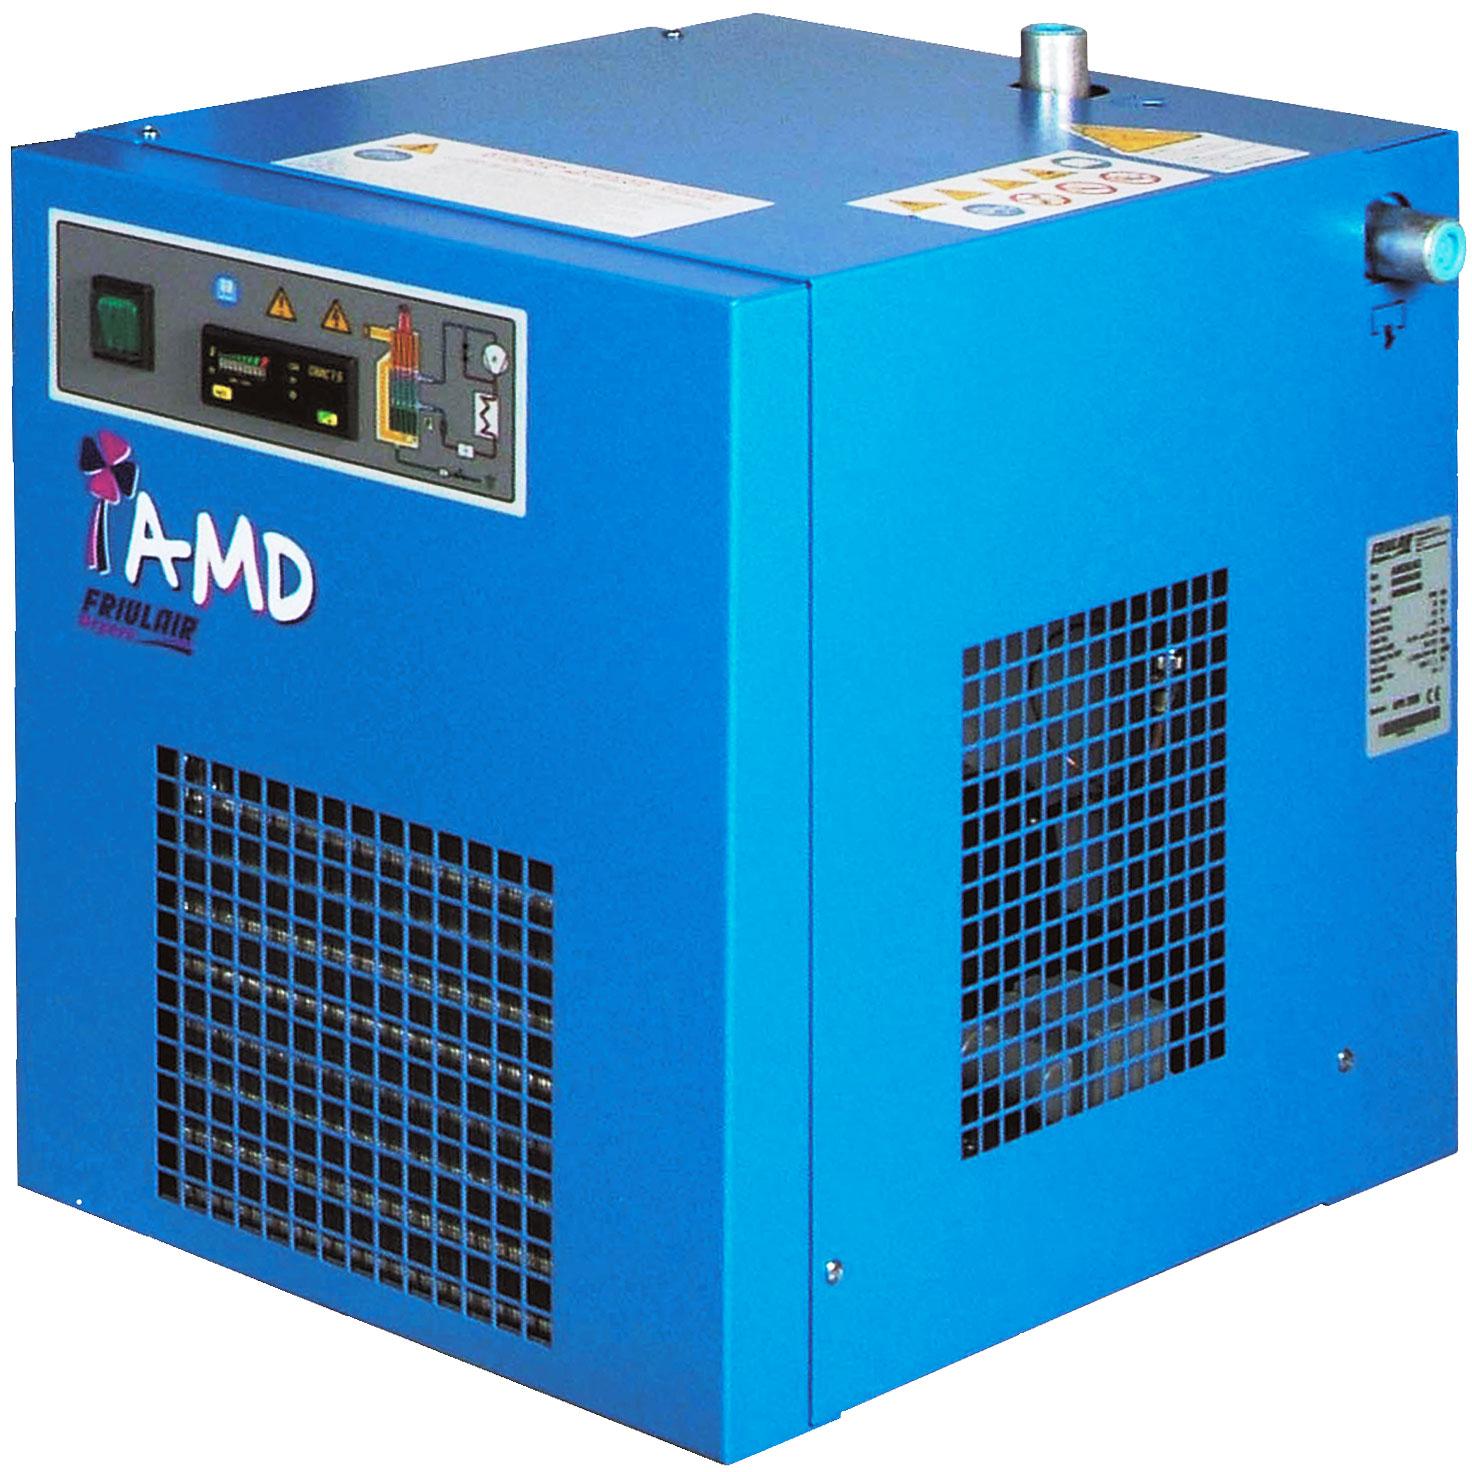 Drymec Compressed Air Dryers